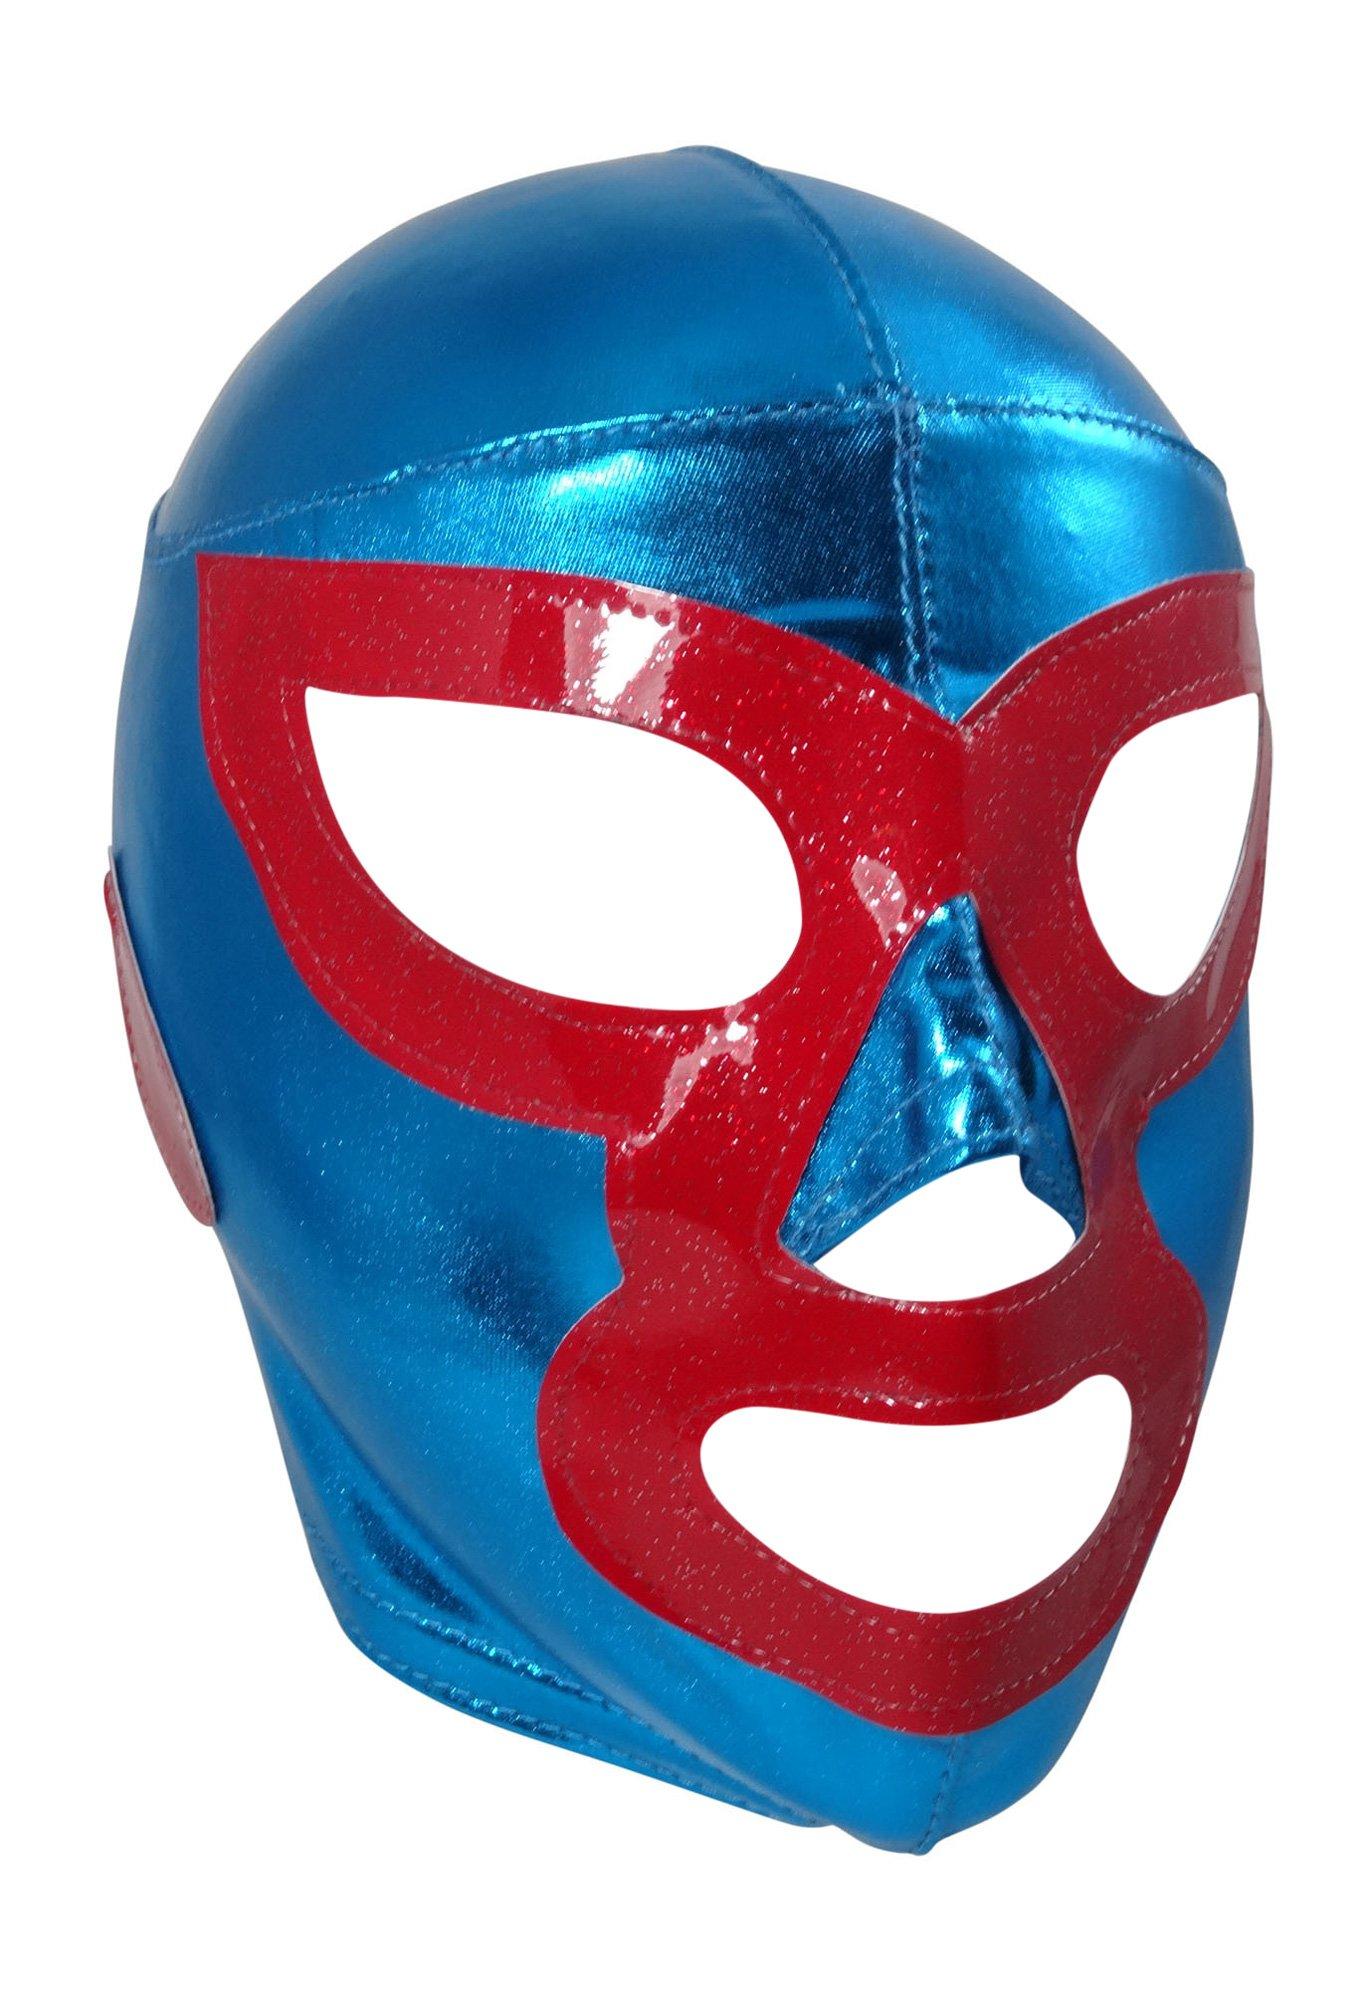 NACHO LIBRE LYCRA Youth Lucha Libre Wrestling Mask - KIDS Costume Wear